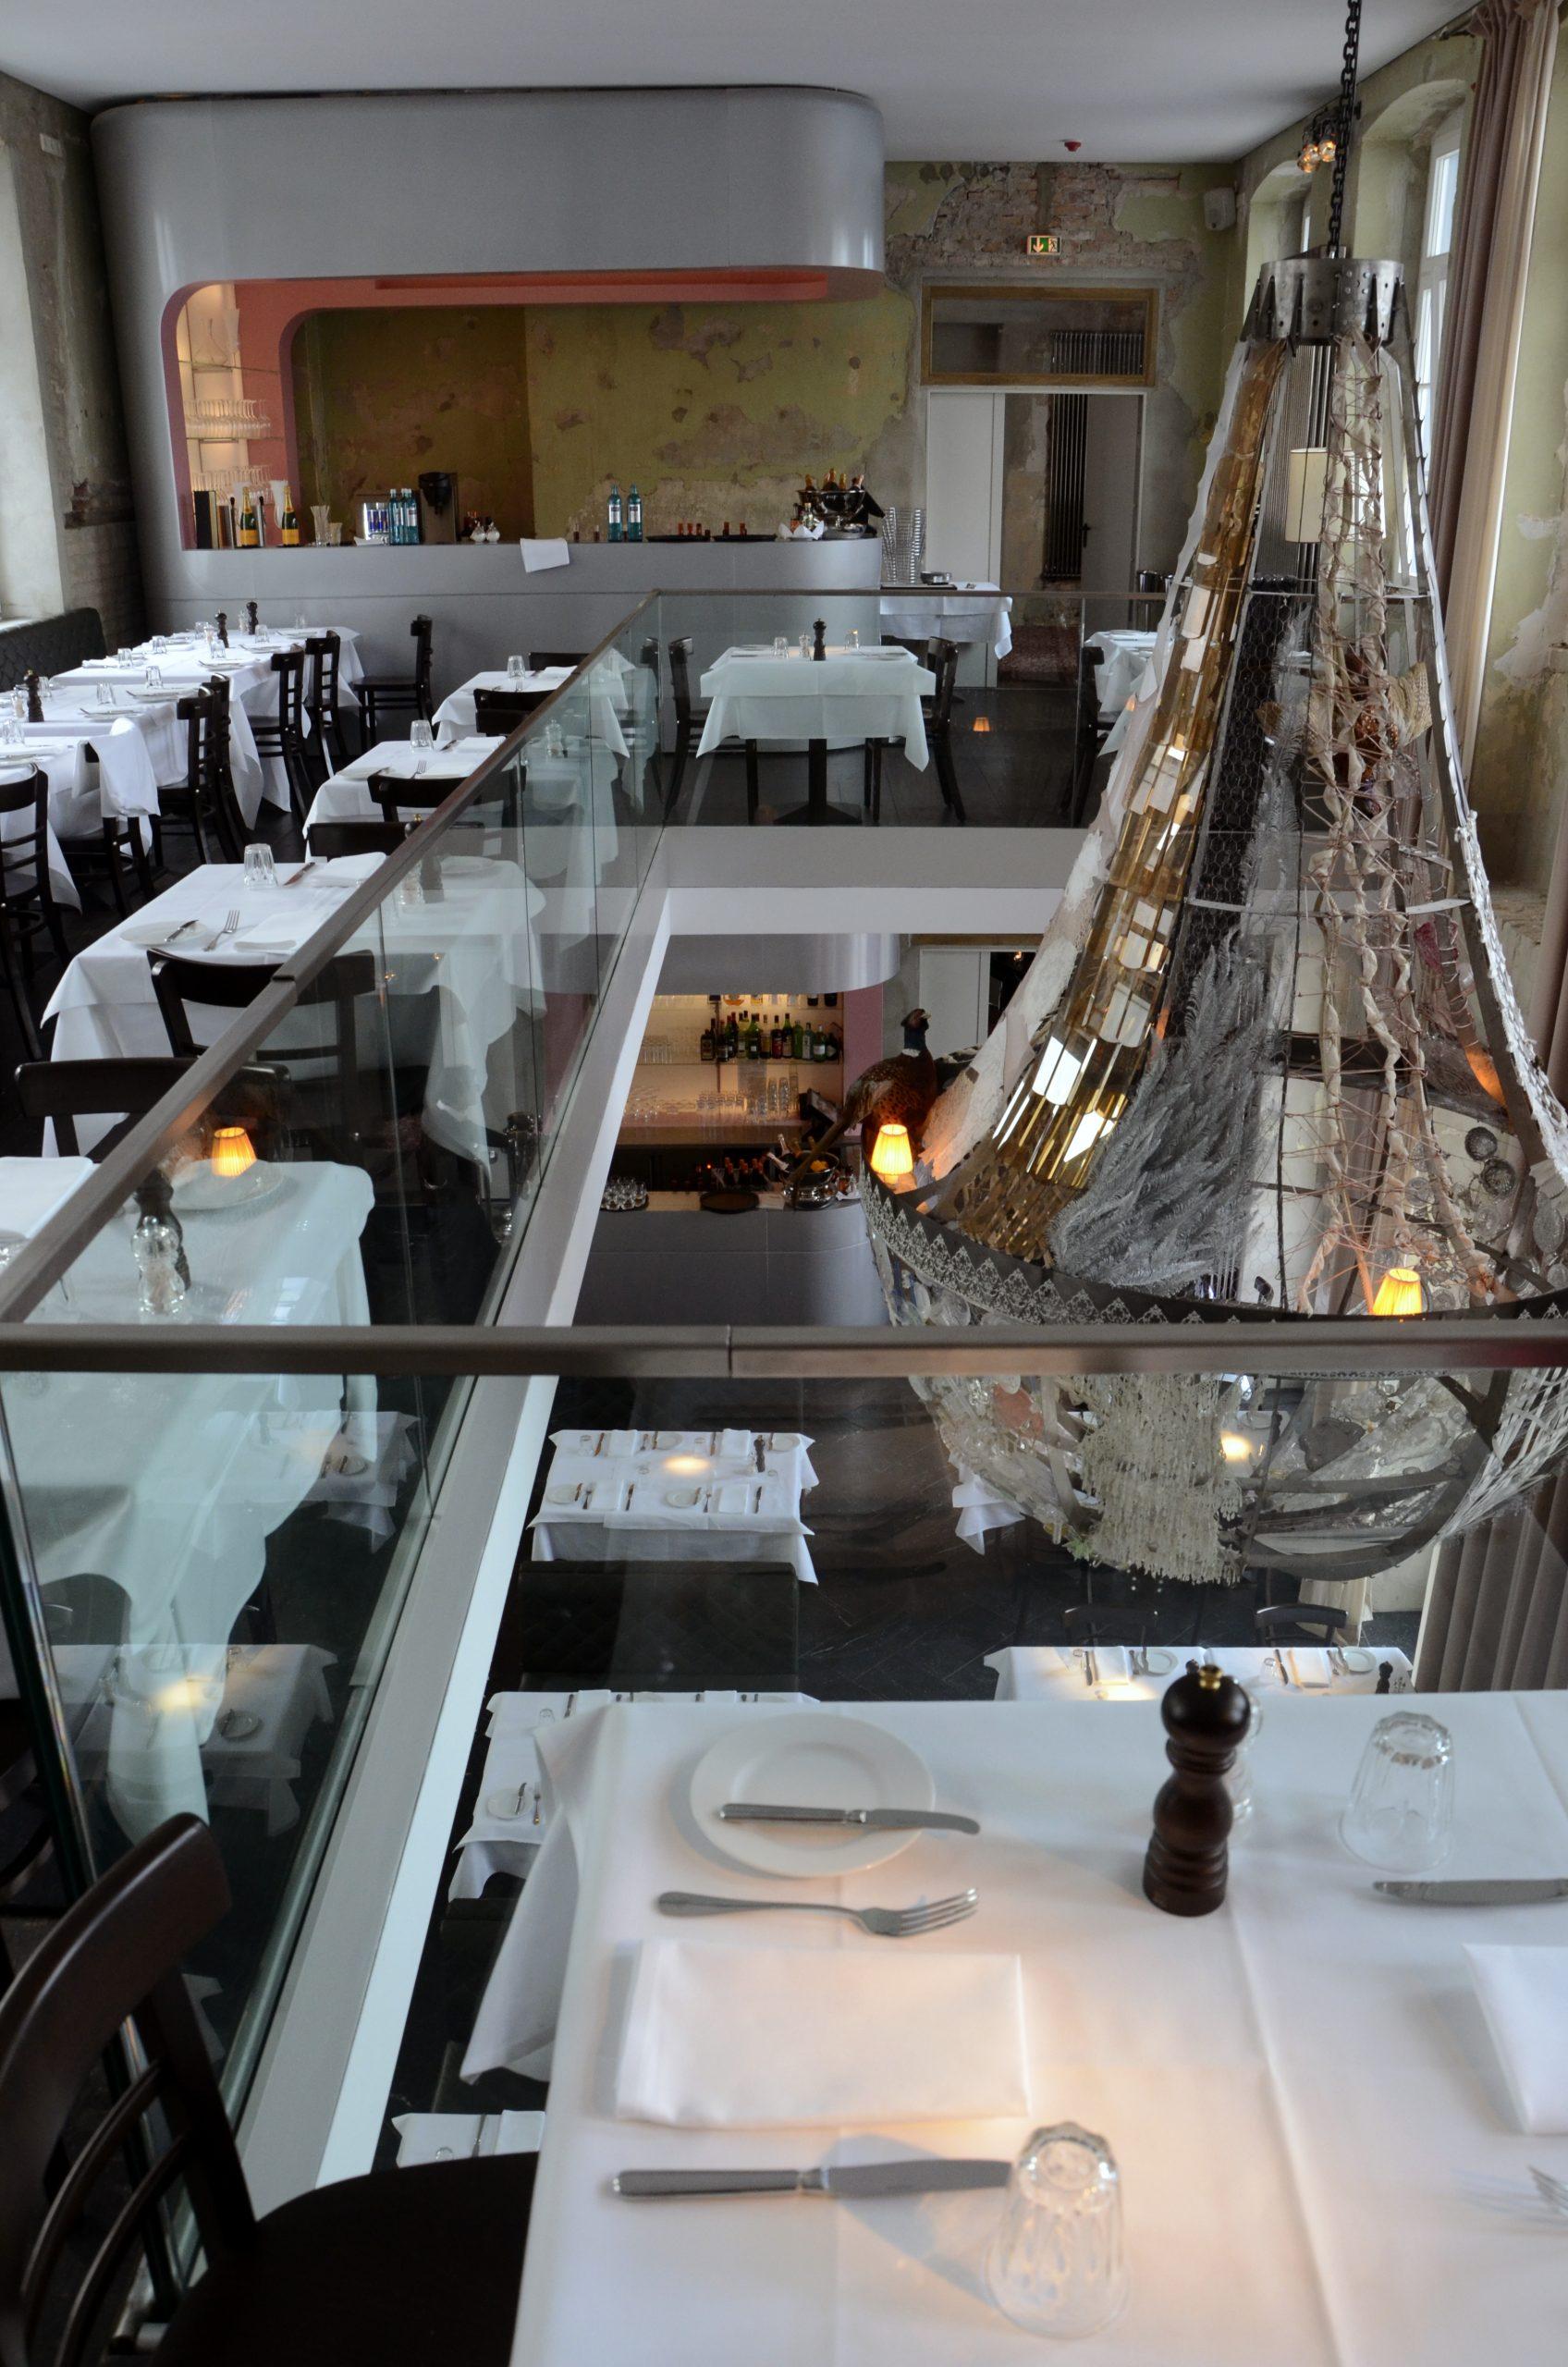 Champagner-Bar in stilvollem Ambiente - Manuela Bross Innenarchitektur